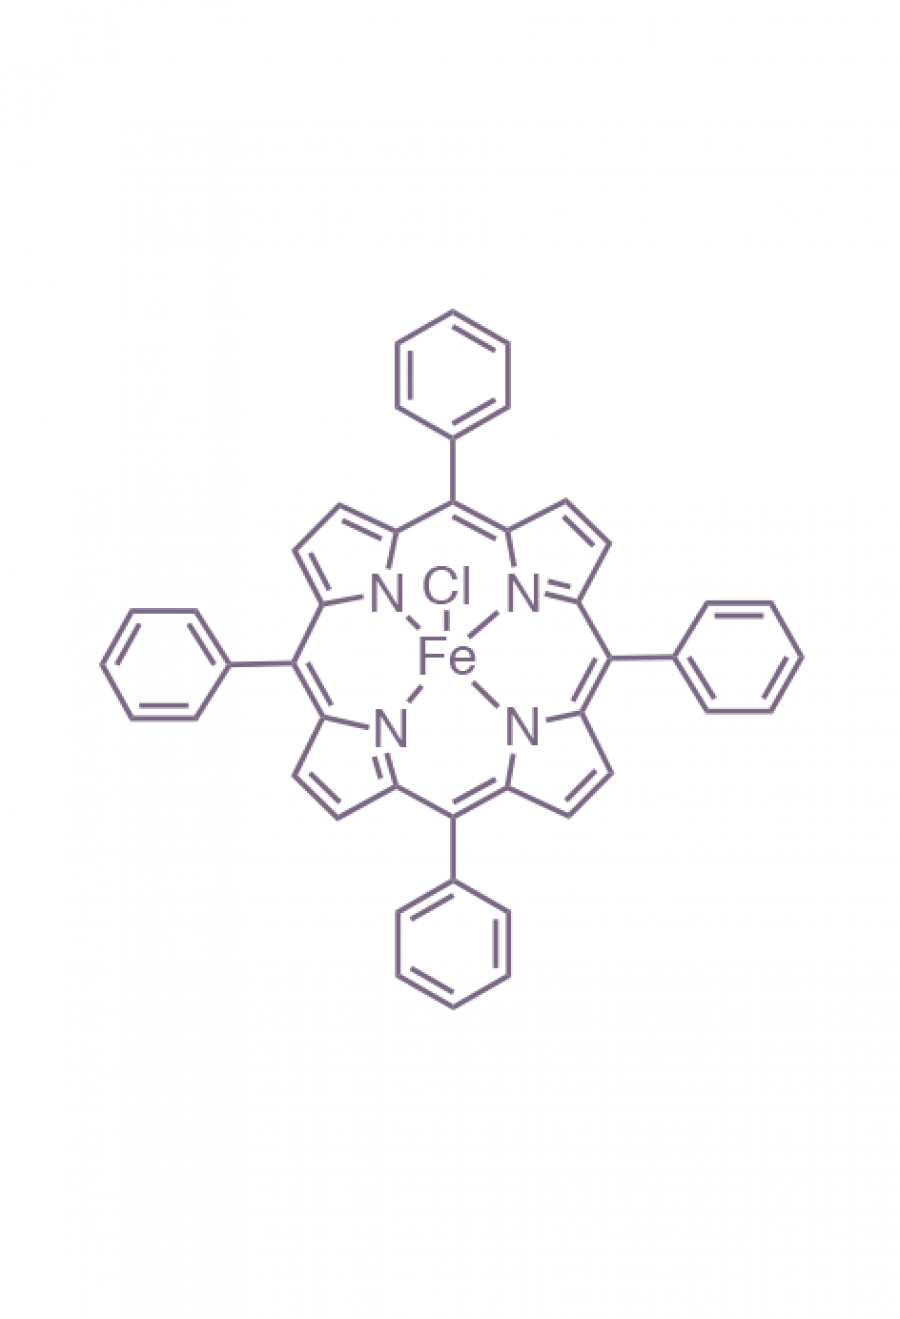 iron(III) 5,10,15,20-(tetraphenyl)porphyrin chloride